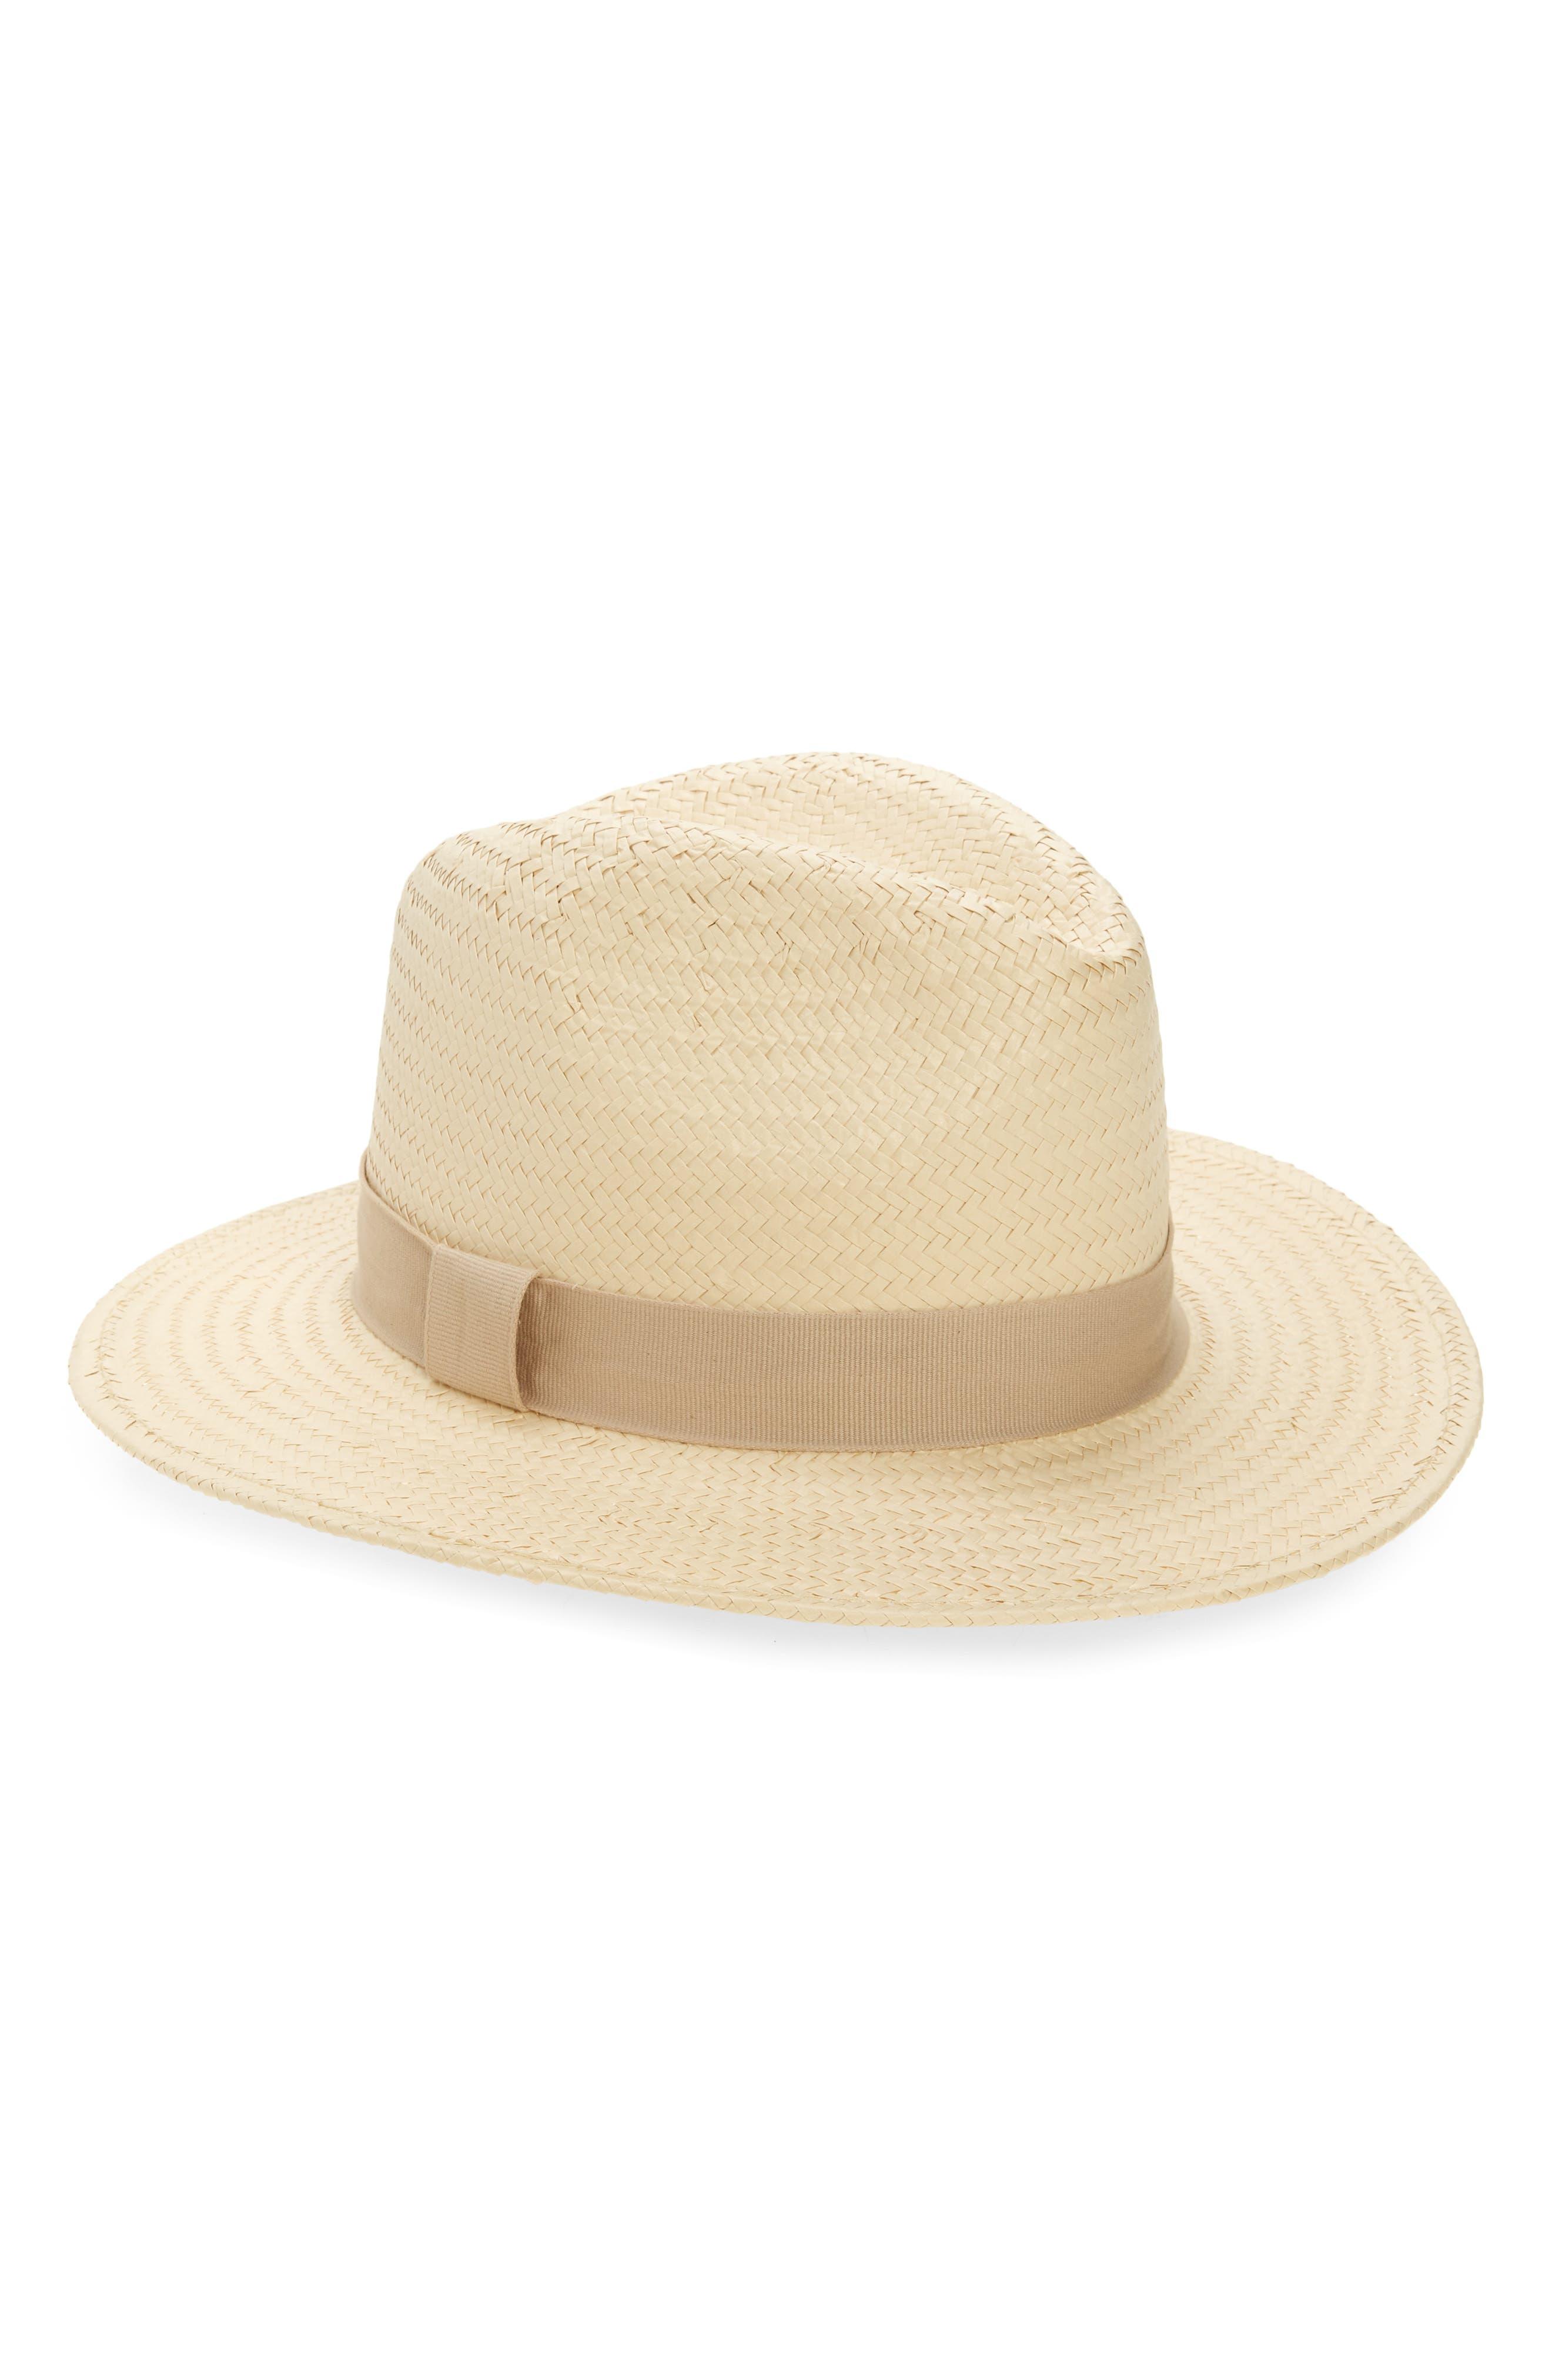 X Biltmore Striped Band Panama Hat